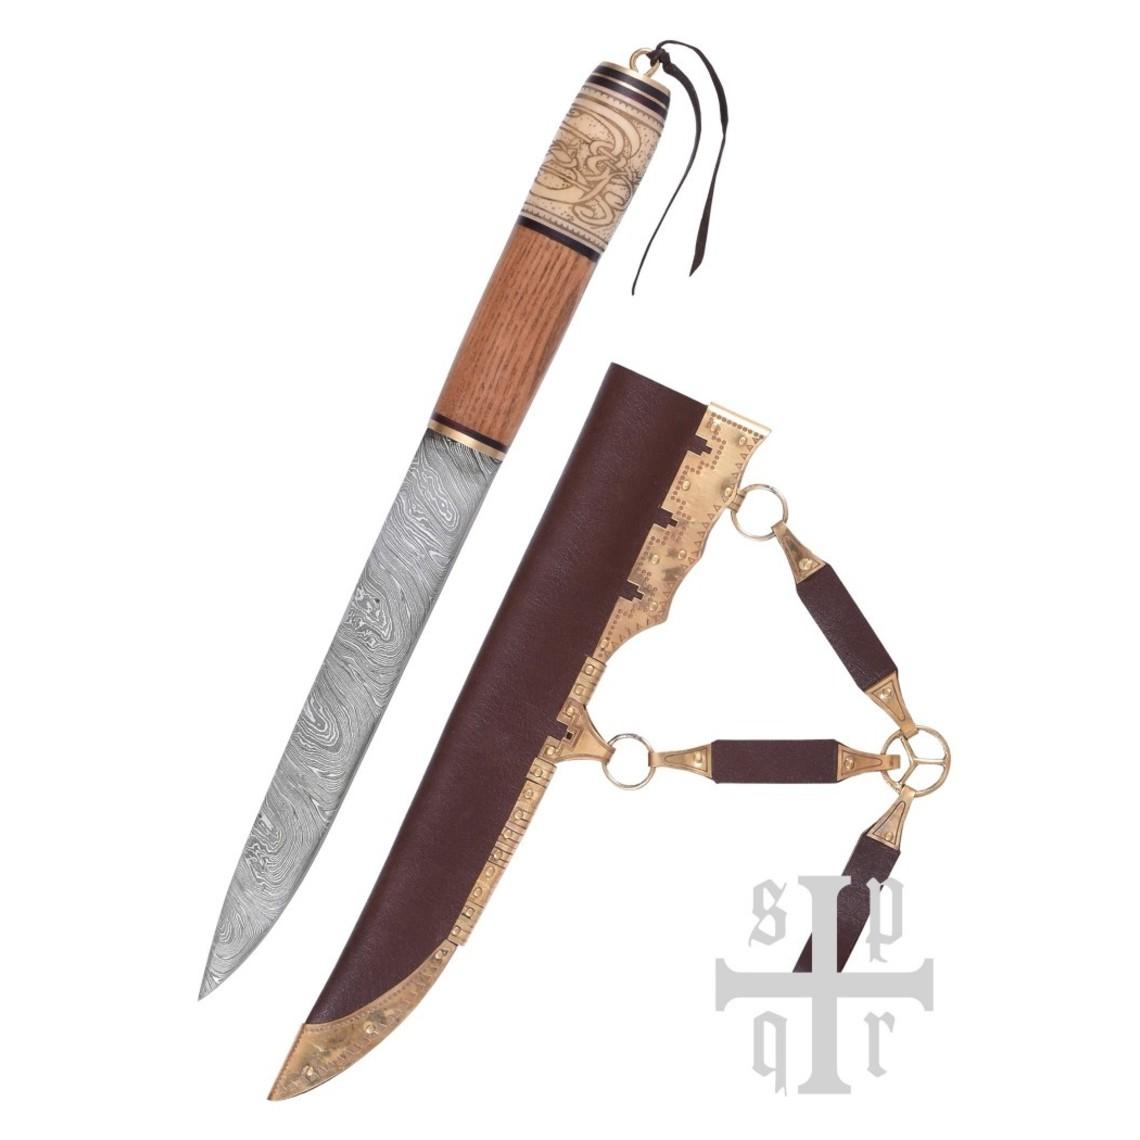 SPQR De Viking seax con motivo de nudo, acero de Damasco